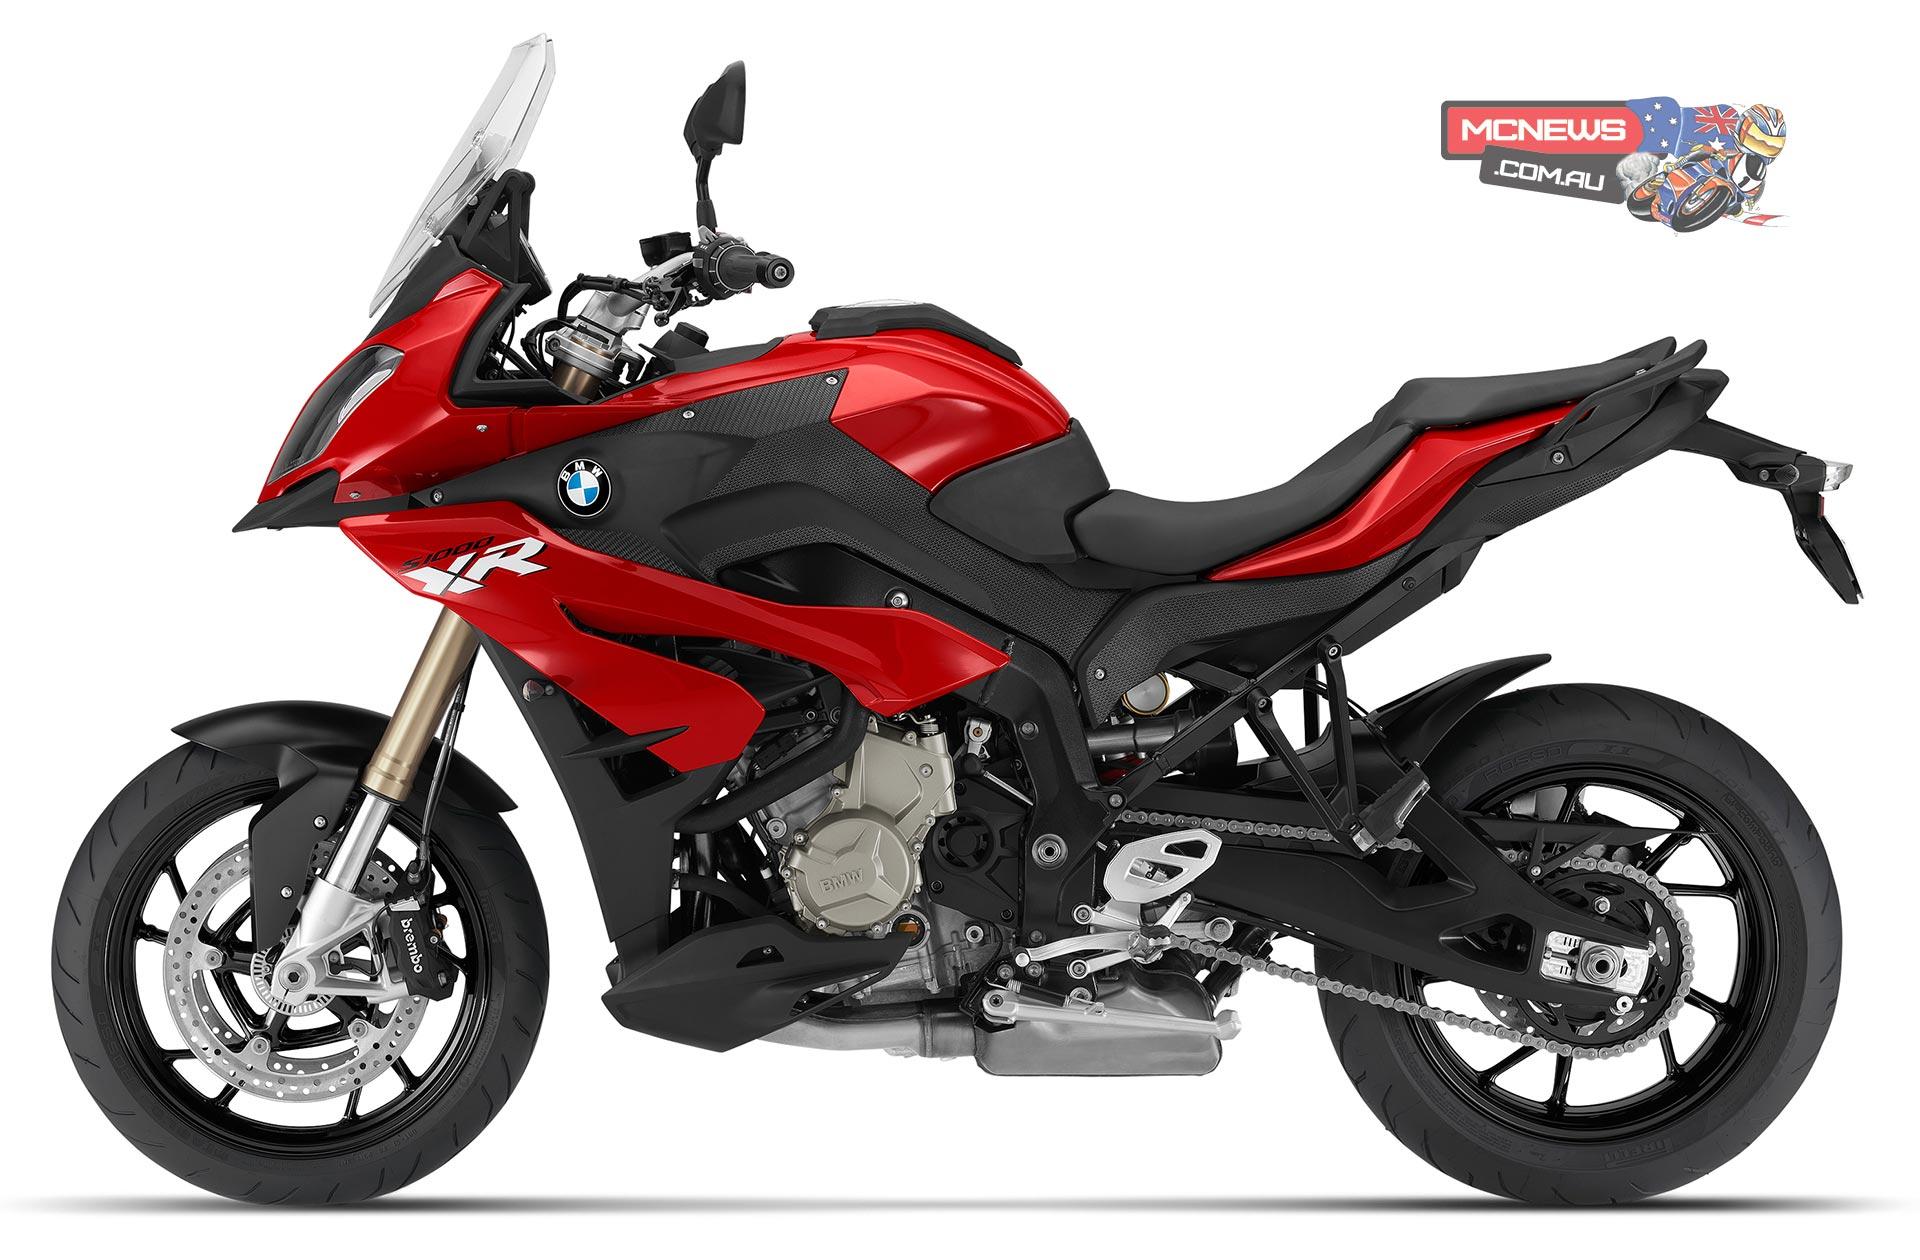 Bmw S 1000 Xr 1000cc All Roader Mcnews Com Au